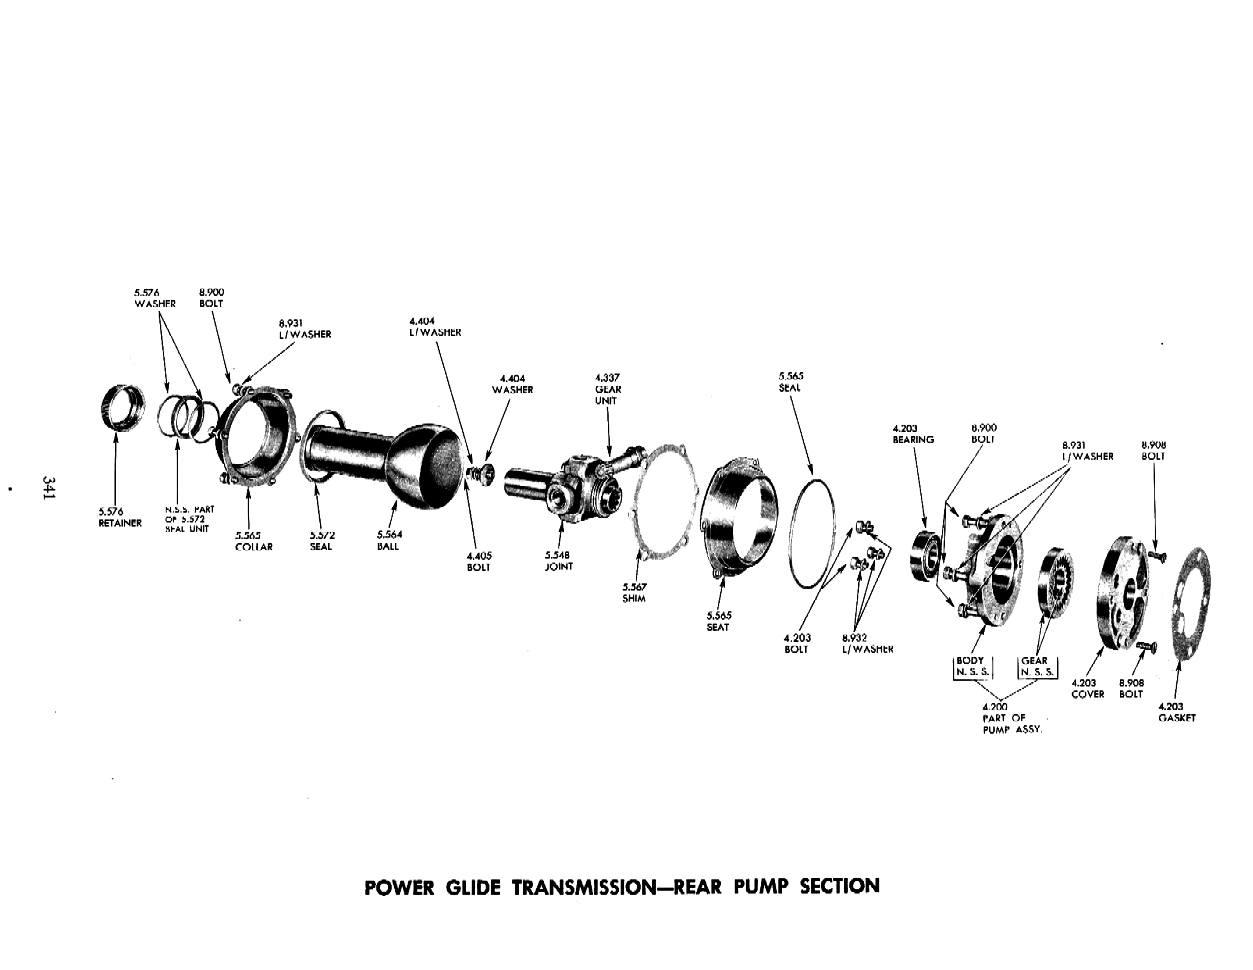 1958 Chevrolet Wiring Diagram Manual 58 Chevy Ebay Wiring